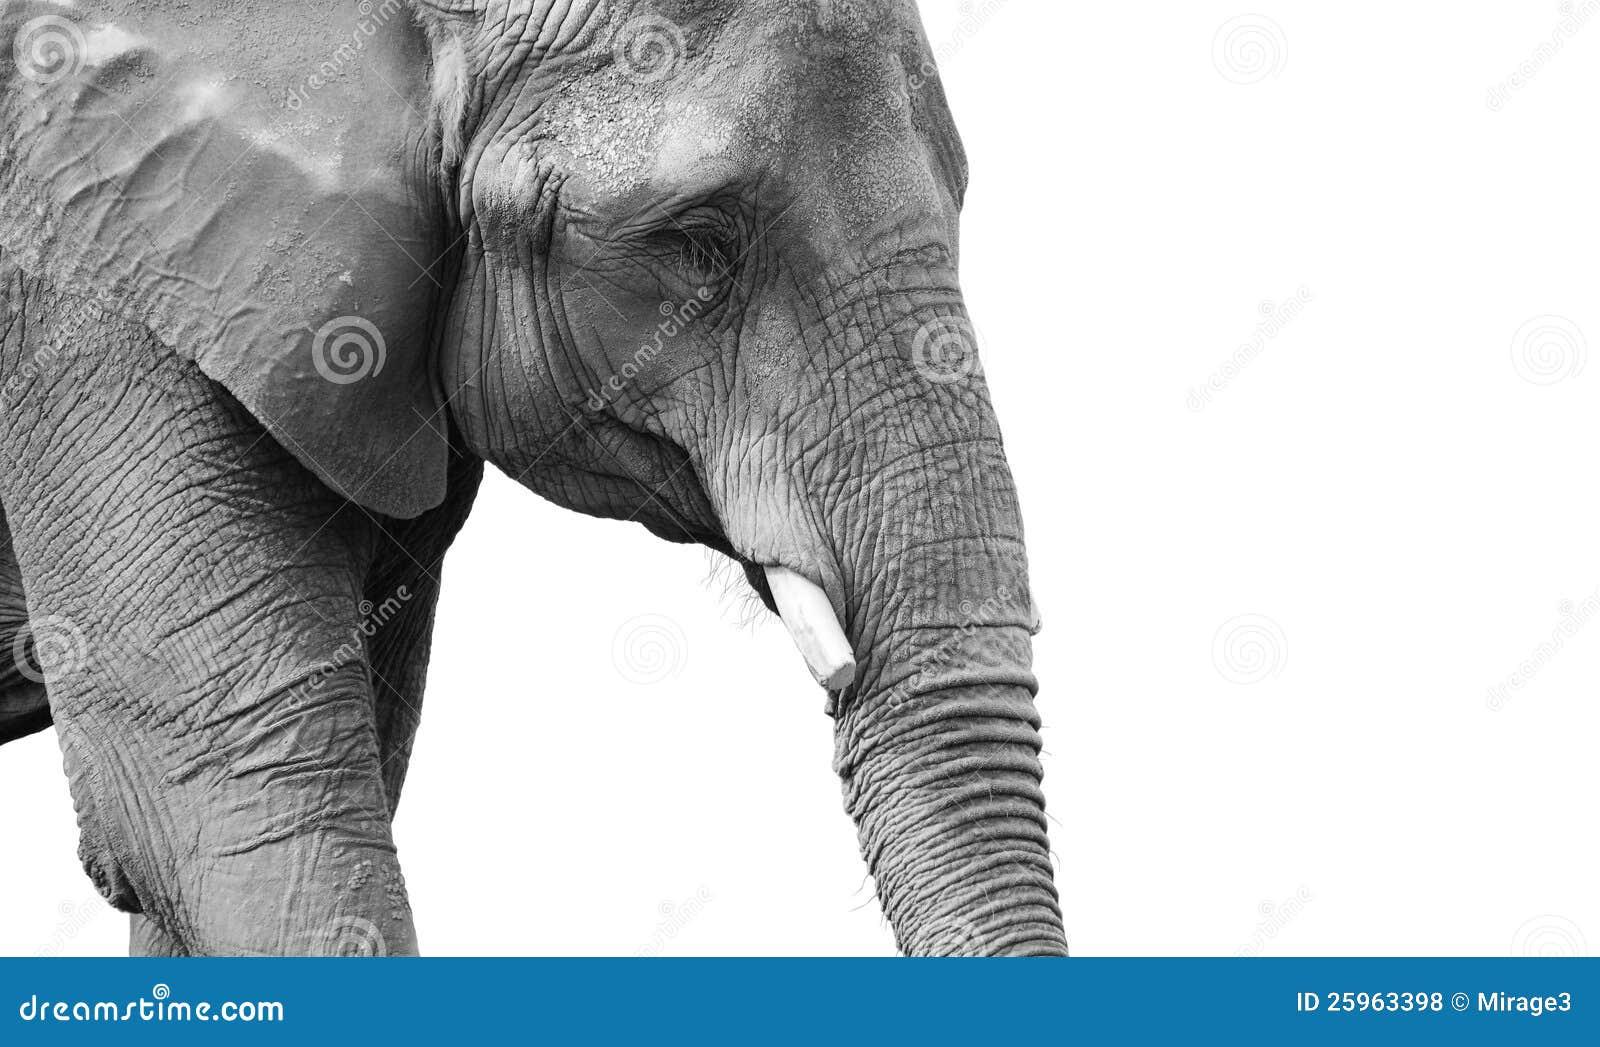 Powerful black and white elephant portrait